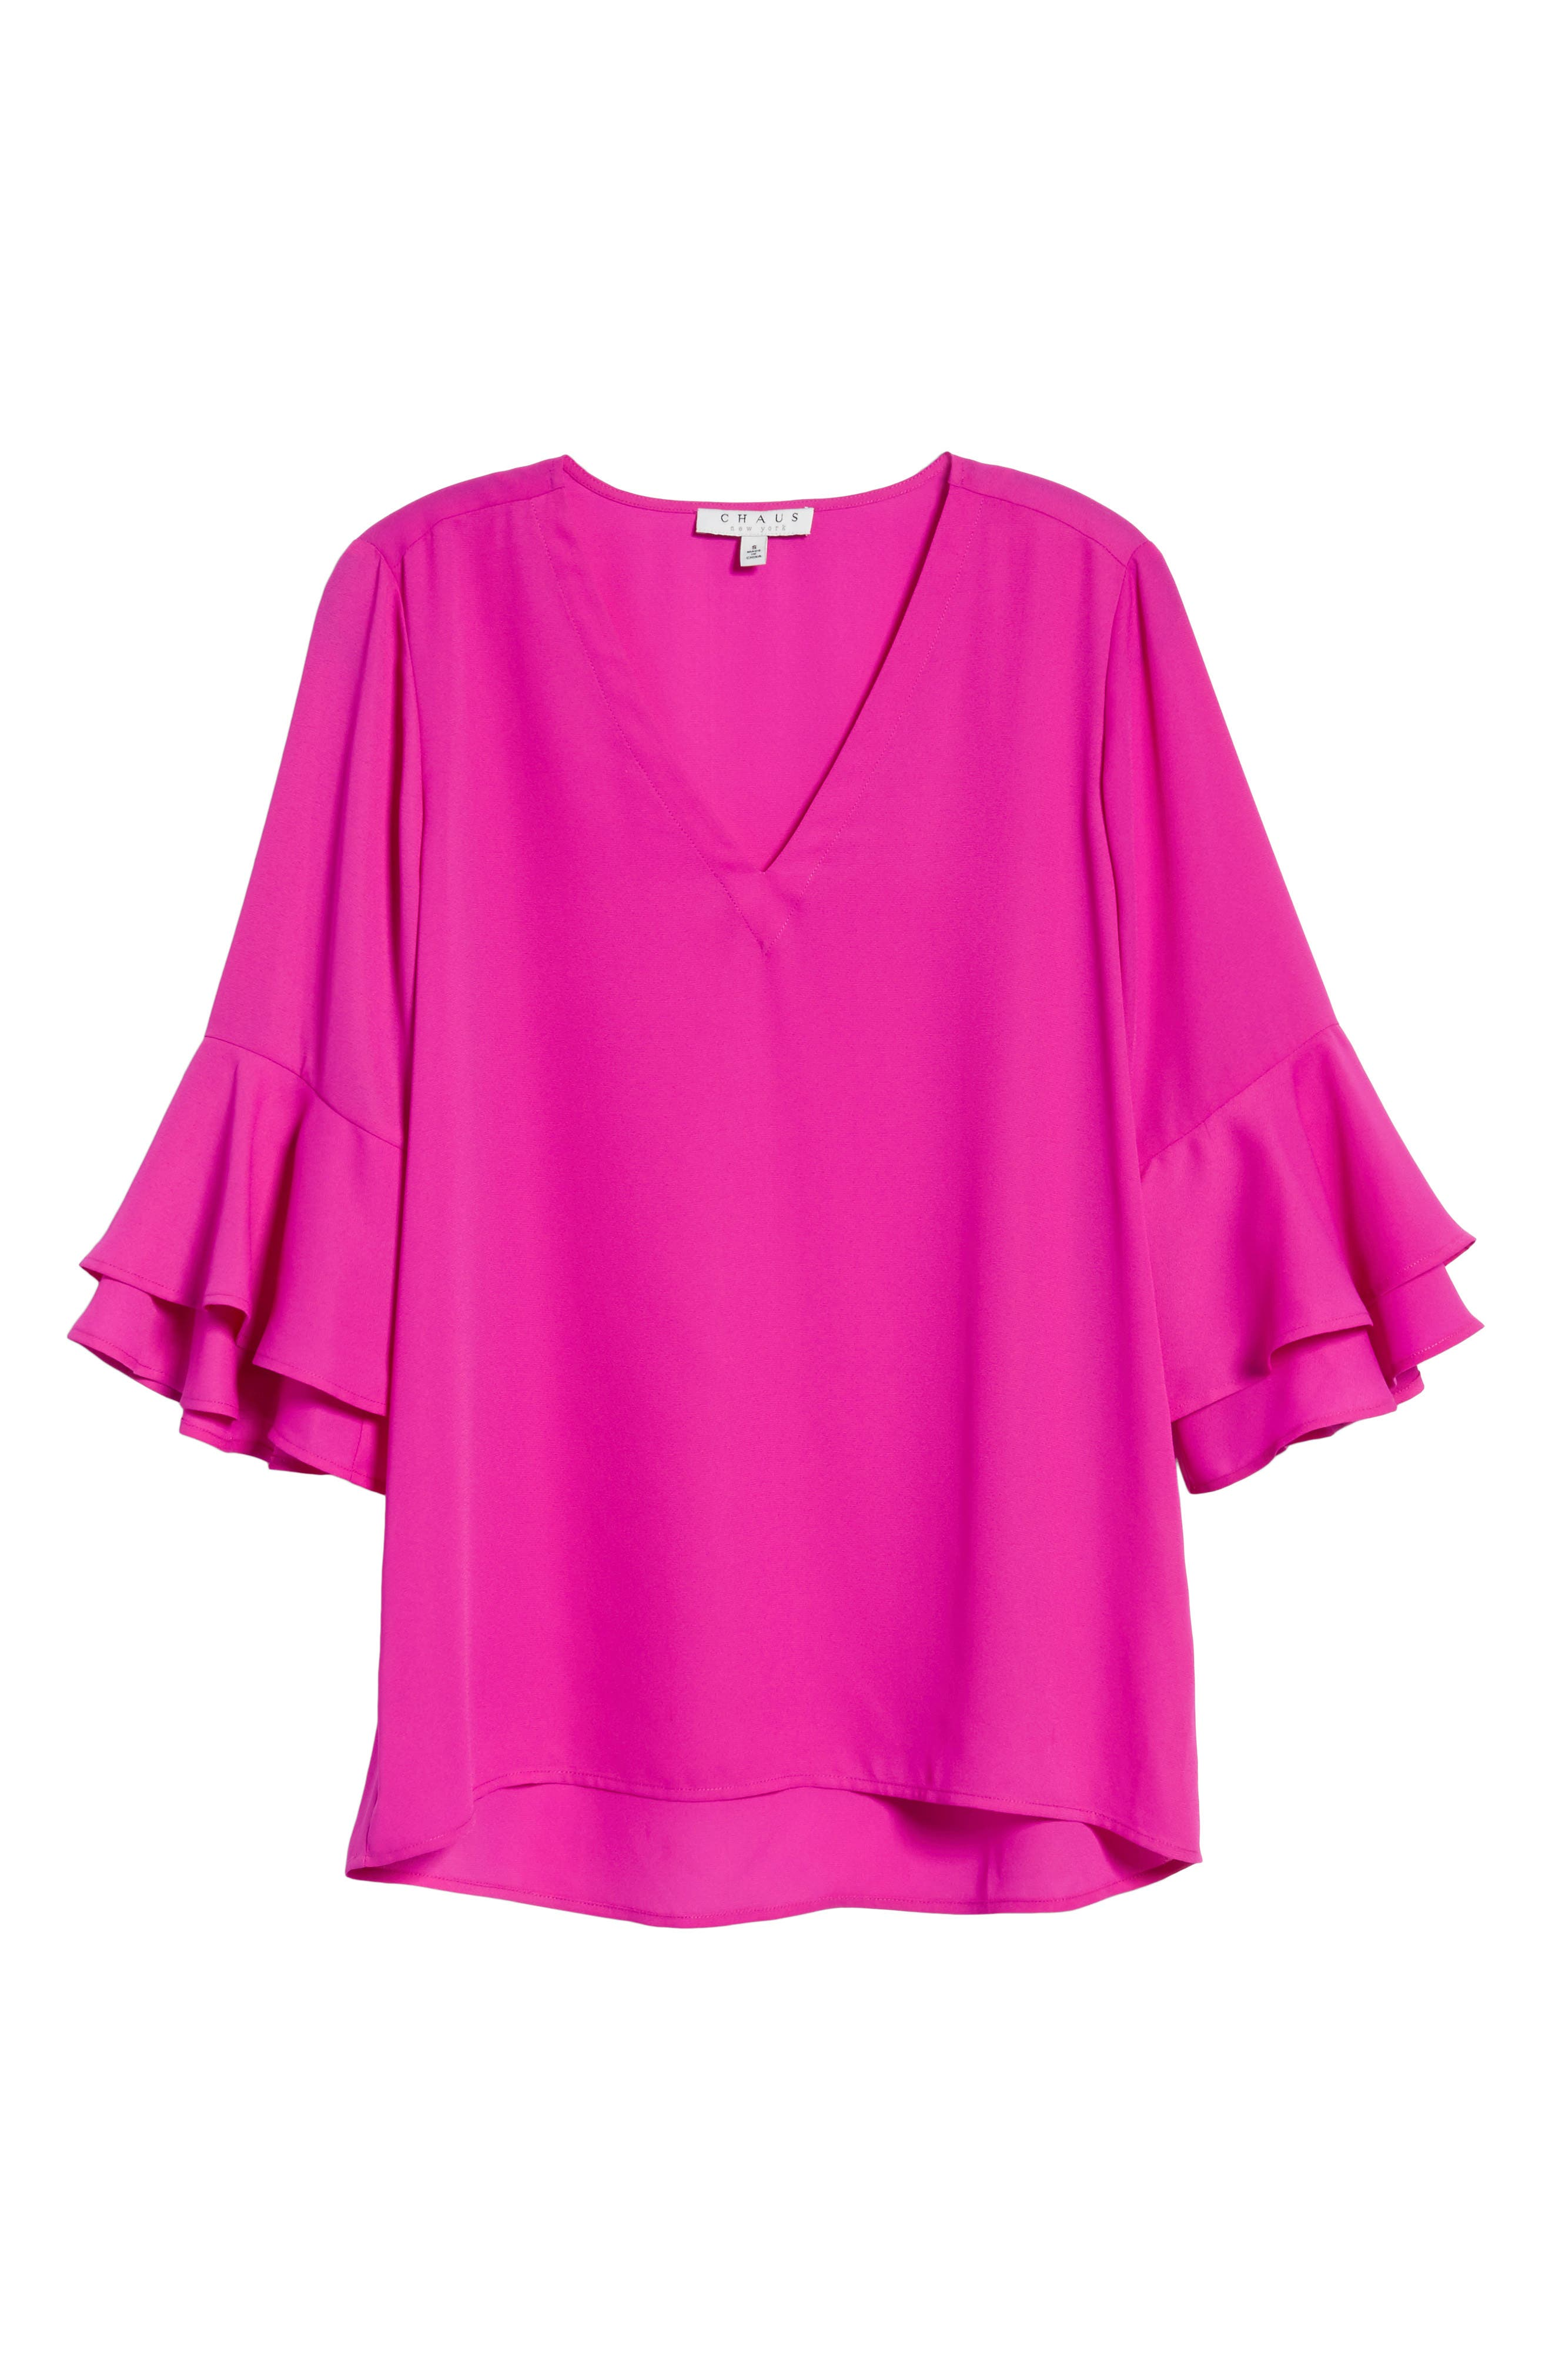 Ruffle Sleeve V-Neck Blouse,                             Alternate thumbnail 6, color,                             686-Pink Nouveau